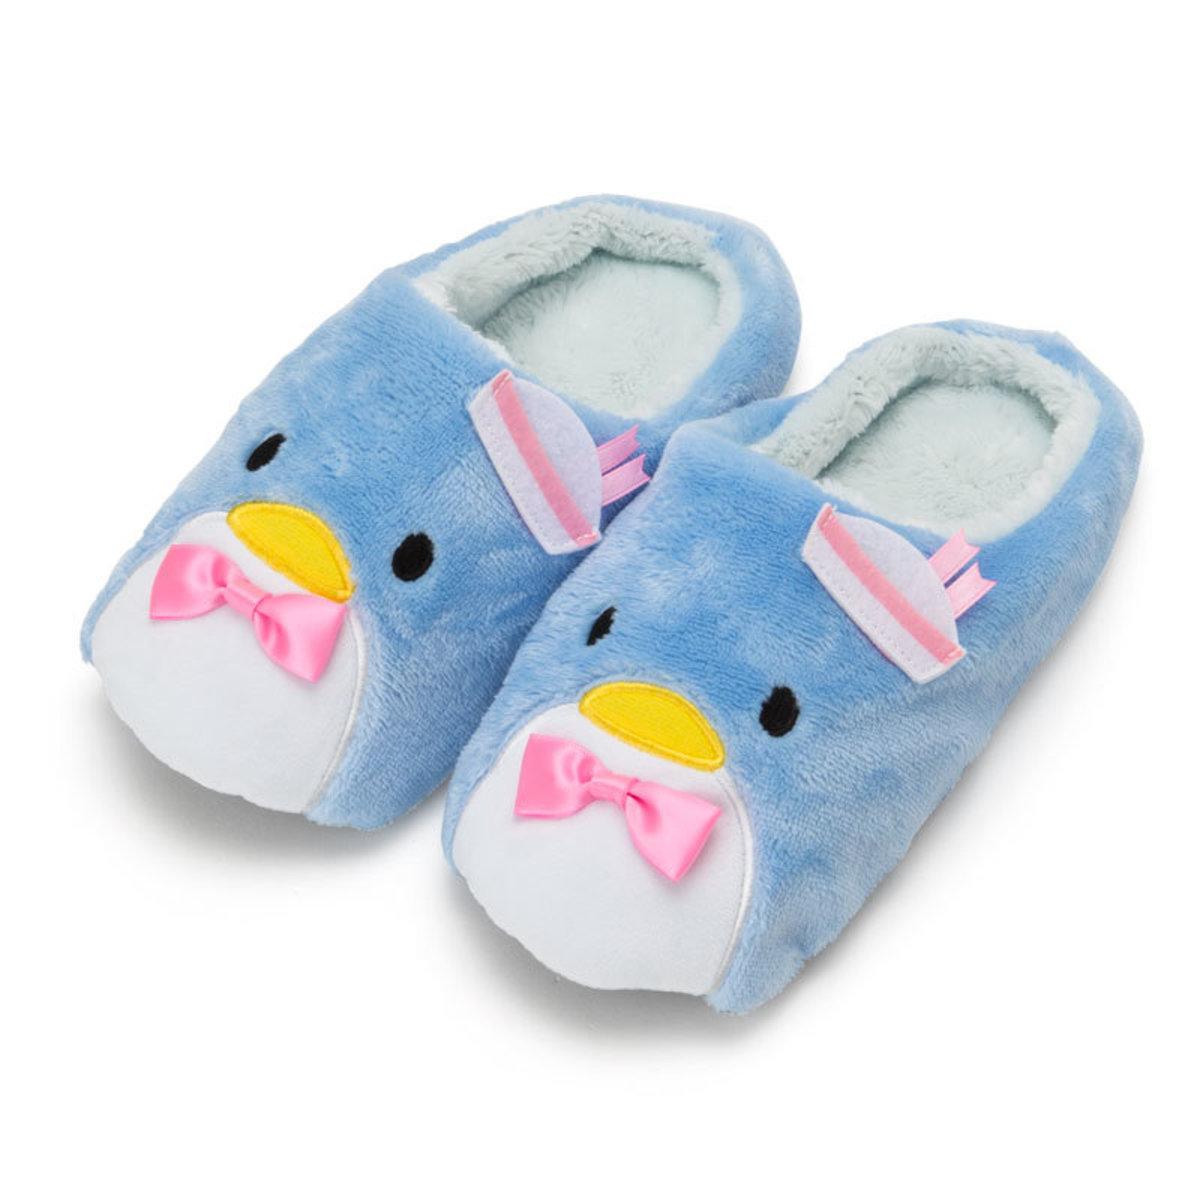 (Tuxedosam/Sam) Japan Sanrio Cartoon Fleece Slippers